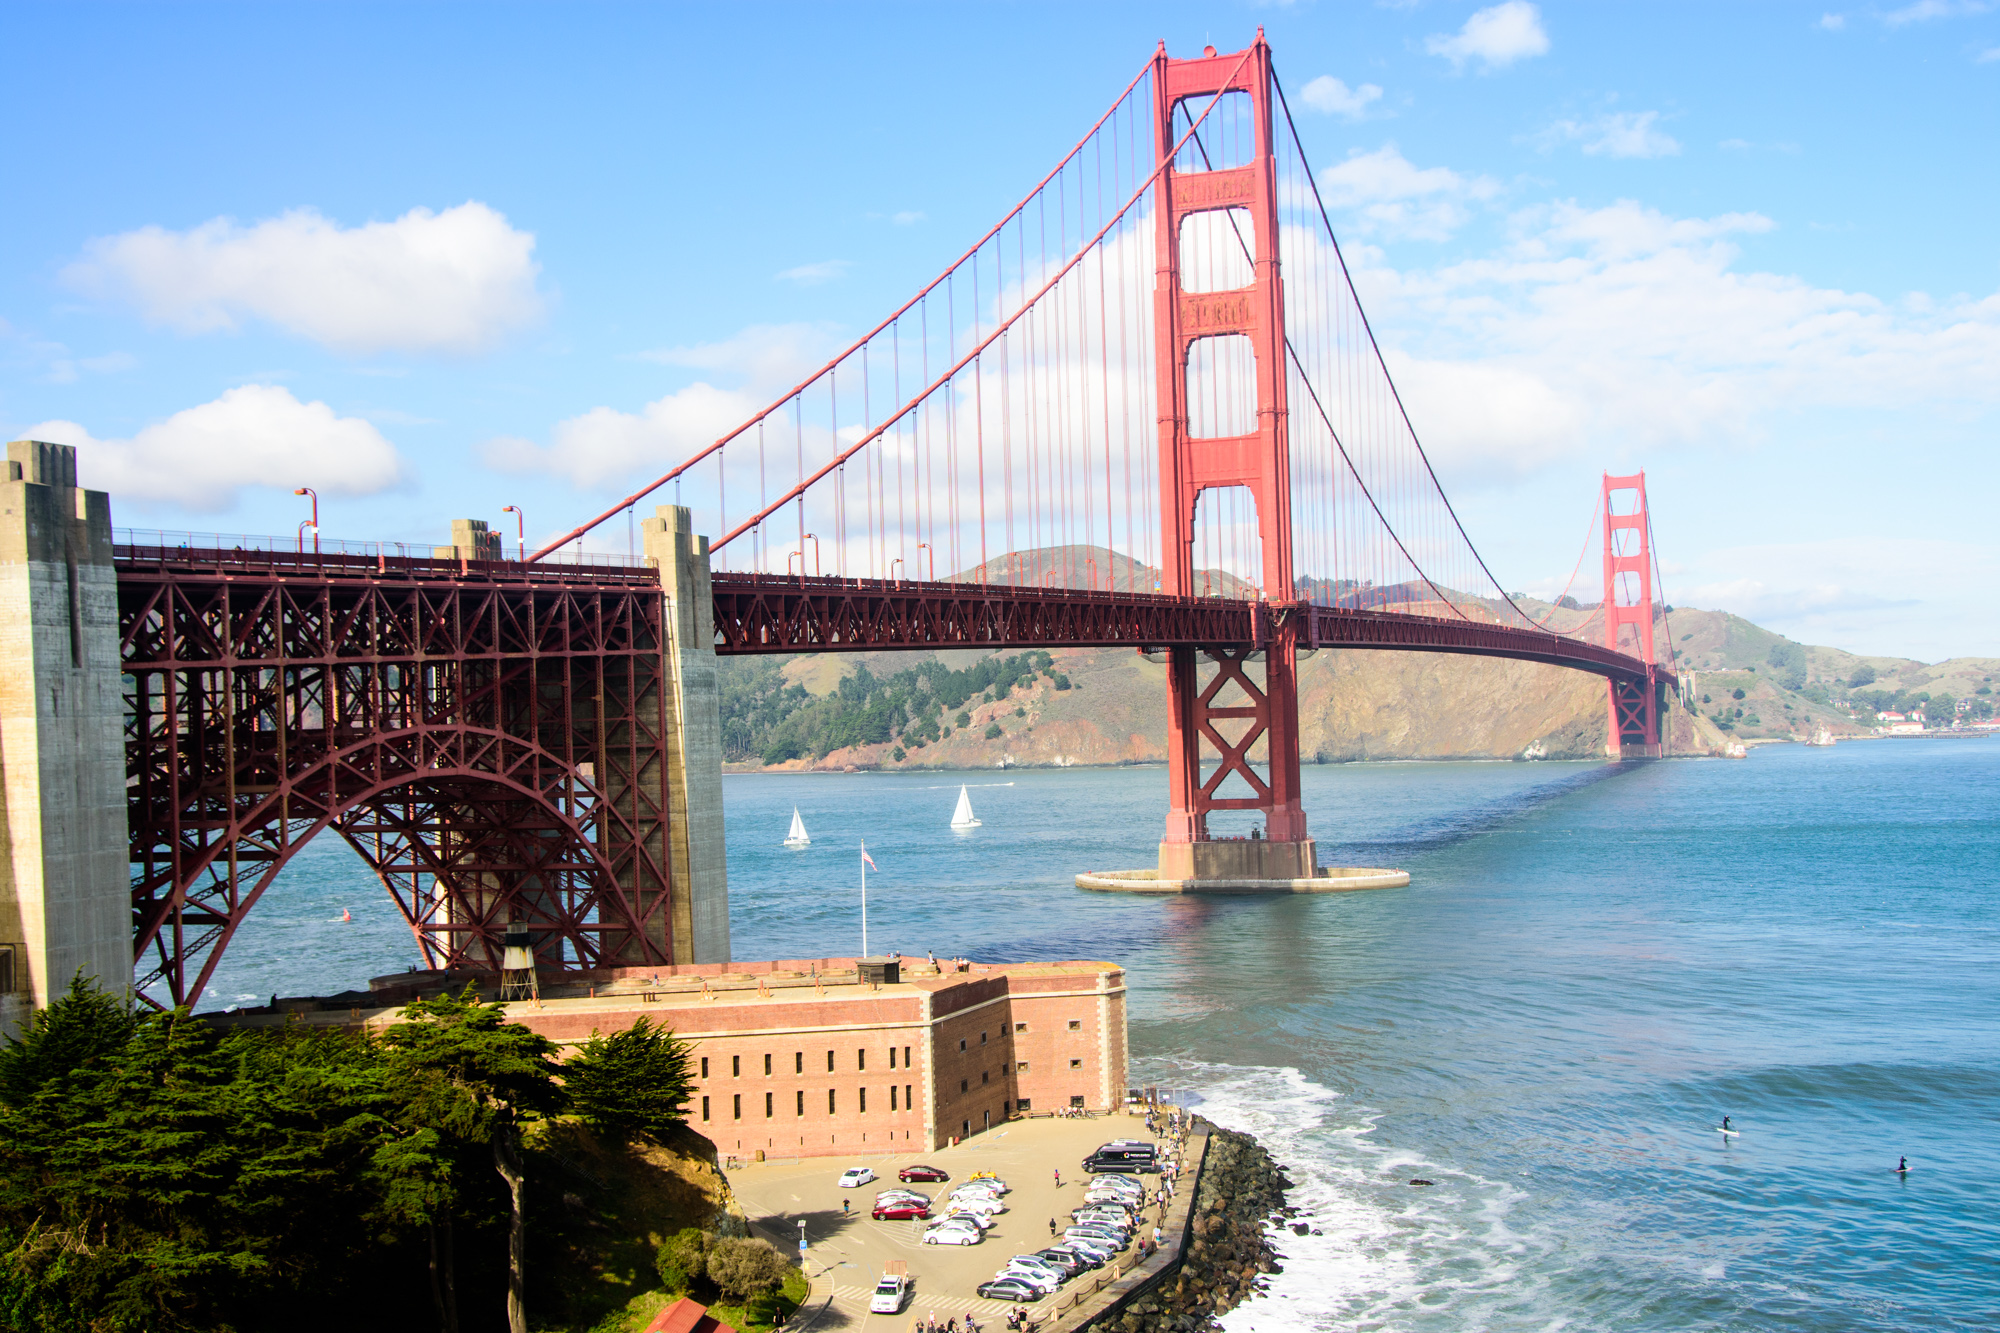 Golden Gate Bridge in full